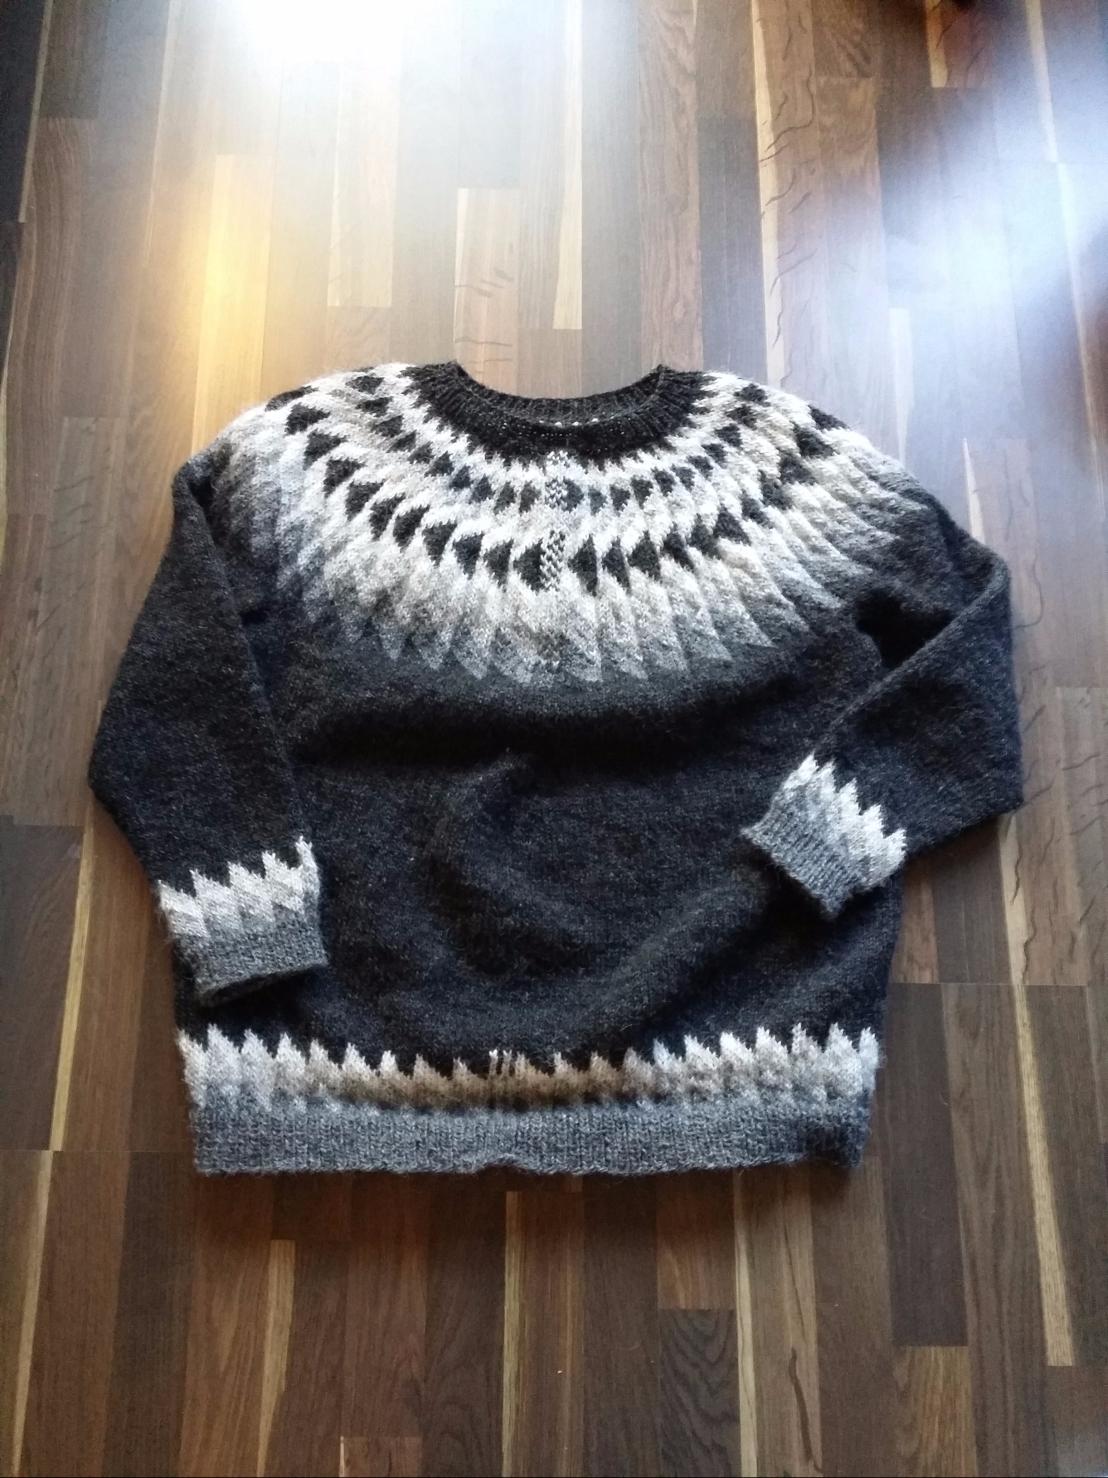 Fred's monochrome sweater (Jón 91149 by HuldaHákonardóttir)